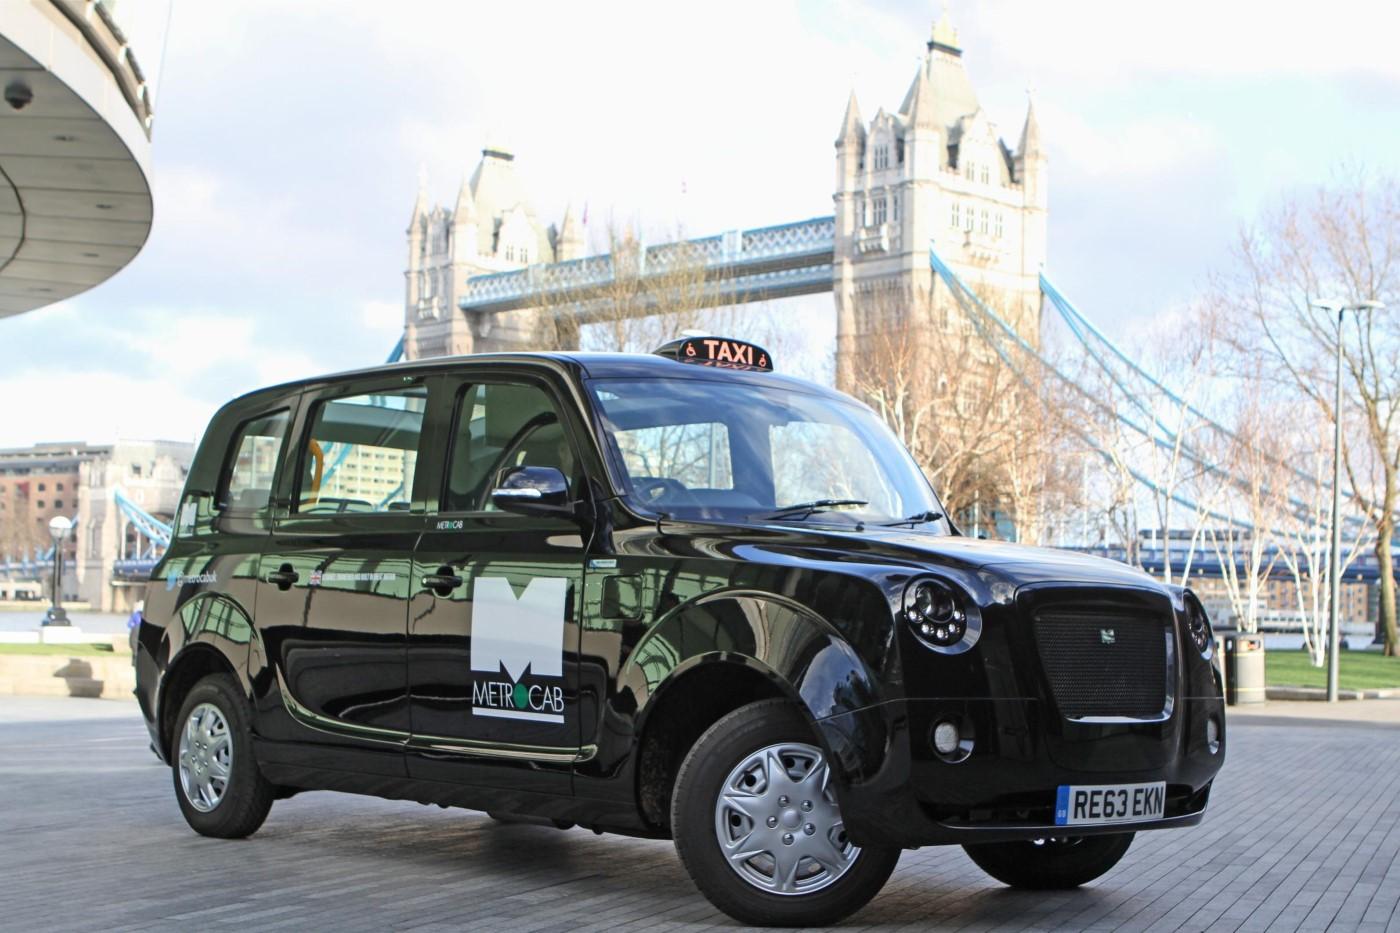 Nissan Metrocab Work On 2018 London Zero Emission Taxi Target